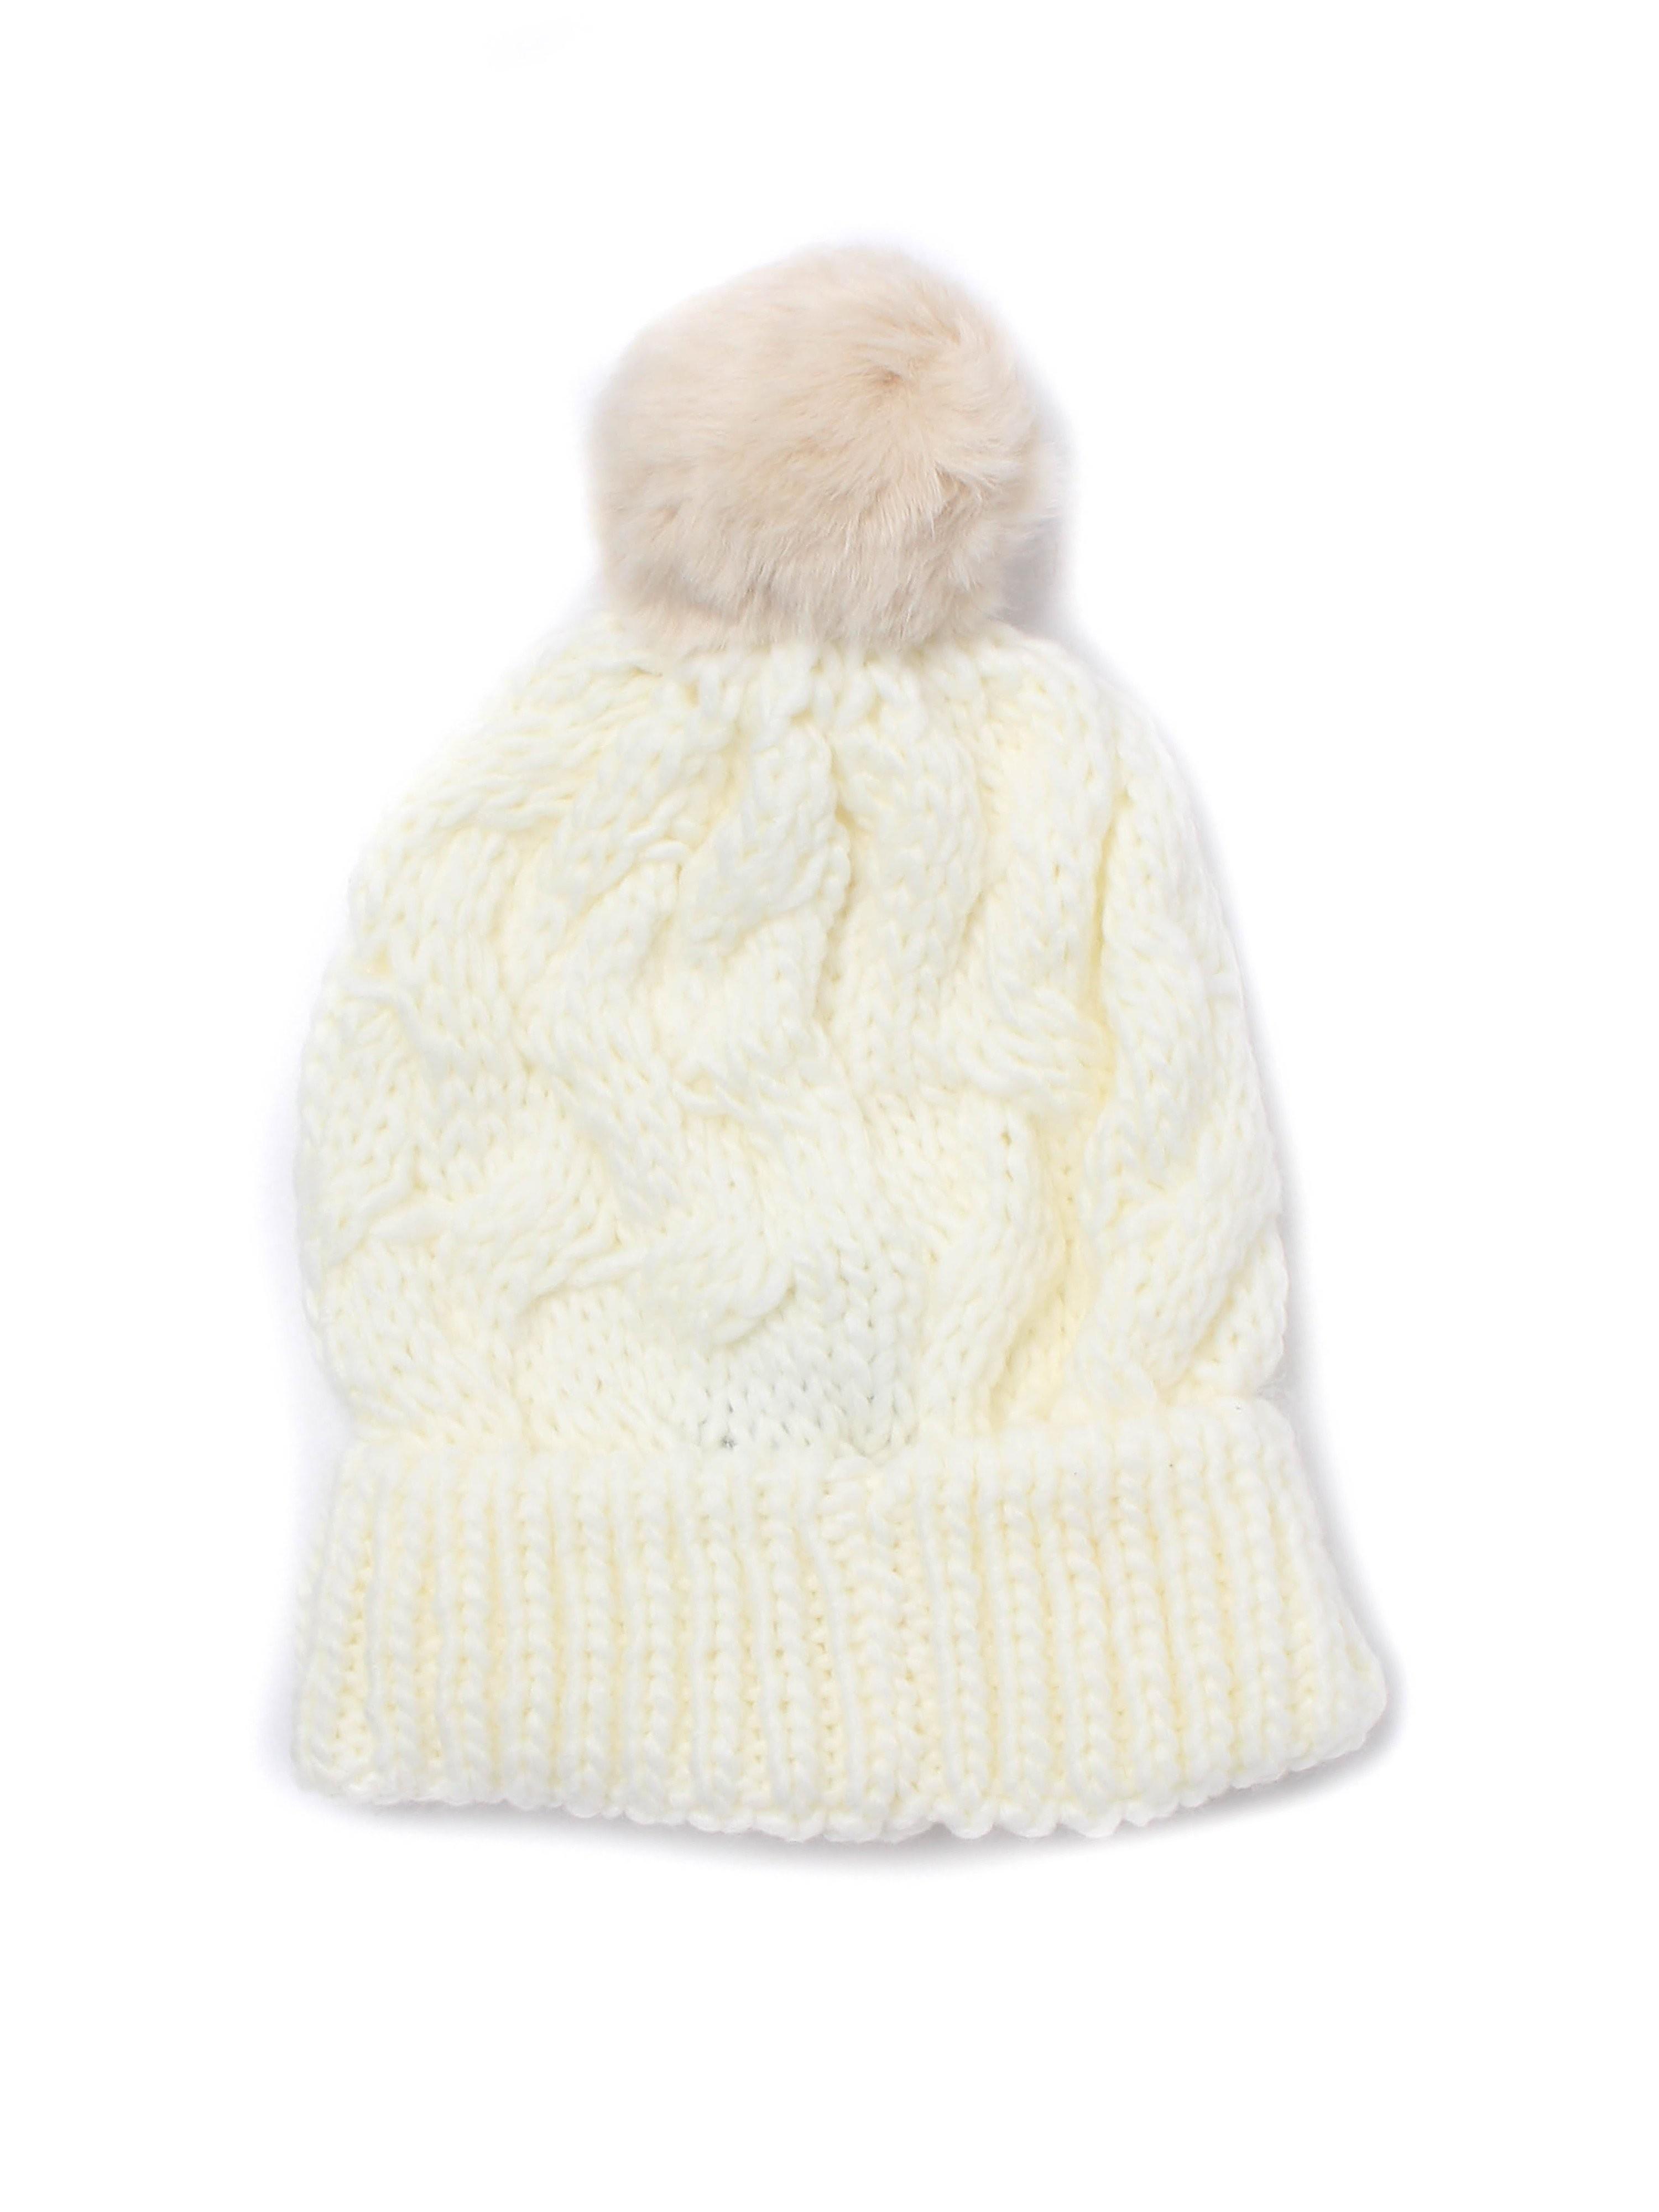 Barbour Fur Pom Beanie - Snow